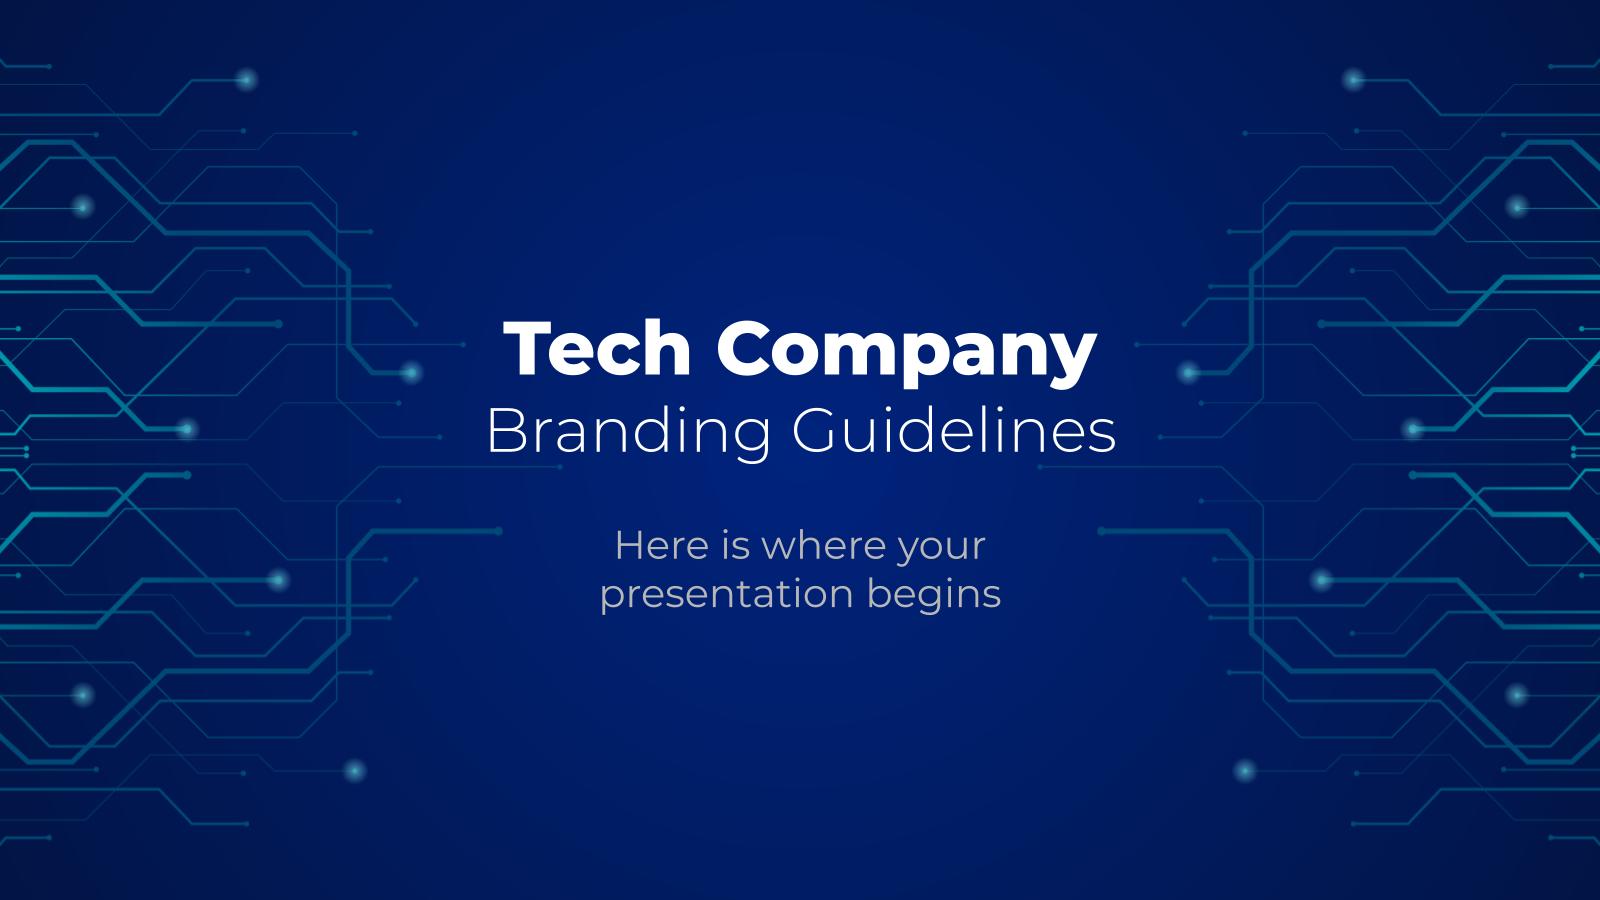 Plantilla de presentación Branding para empresas tecnológicas